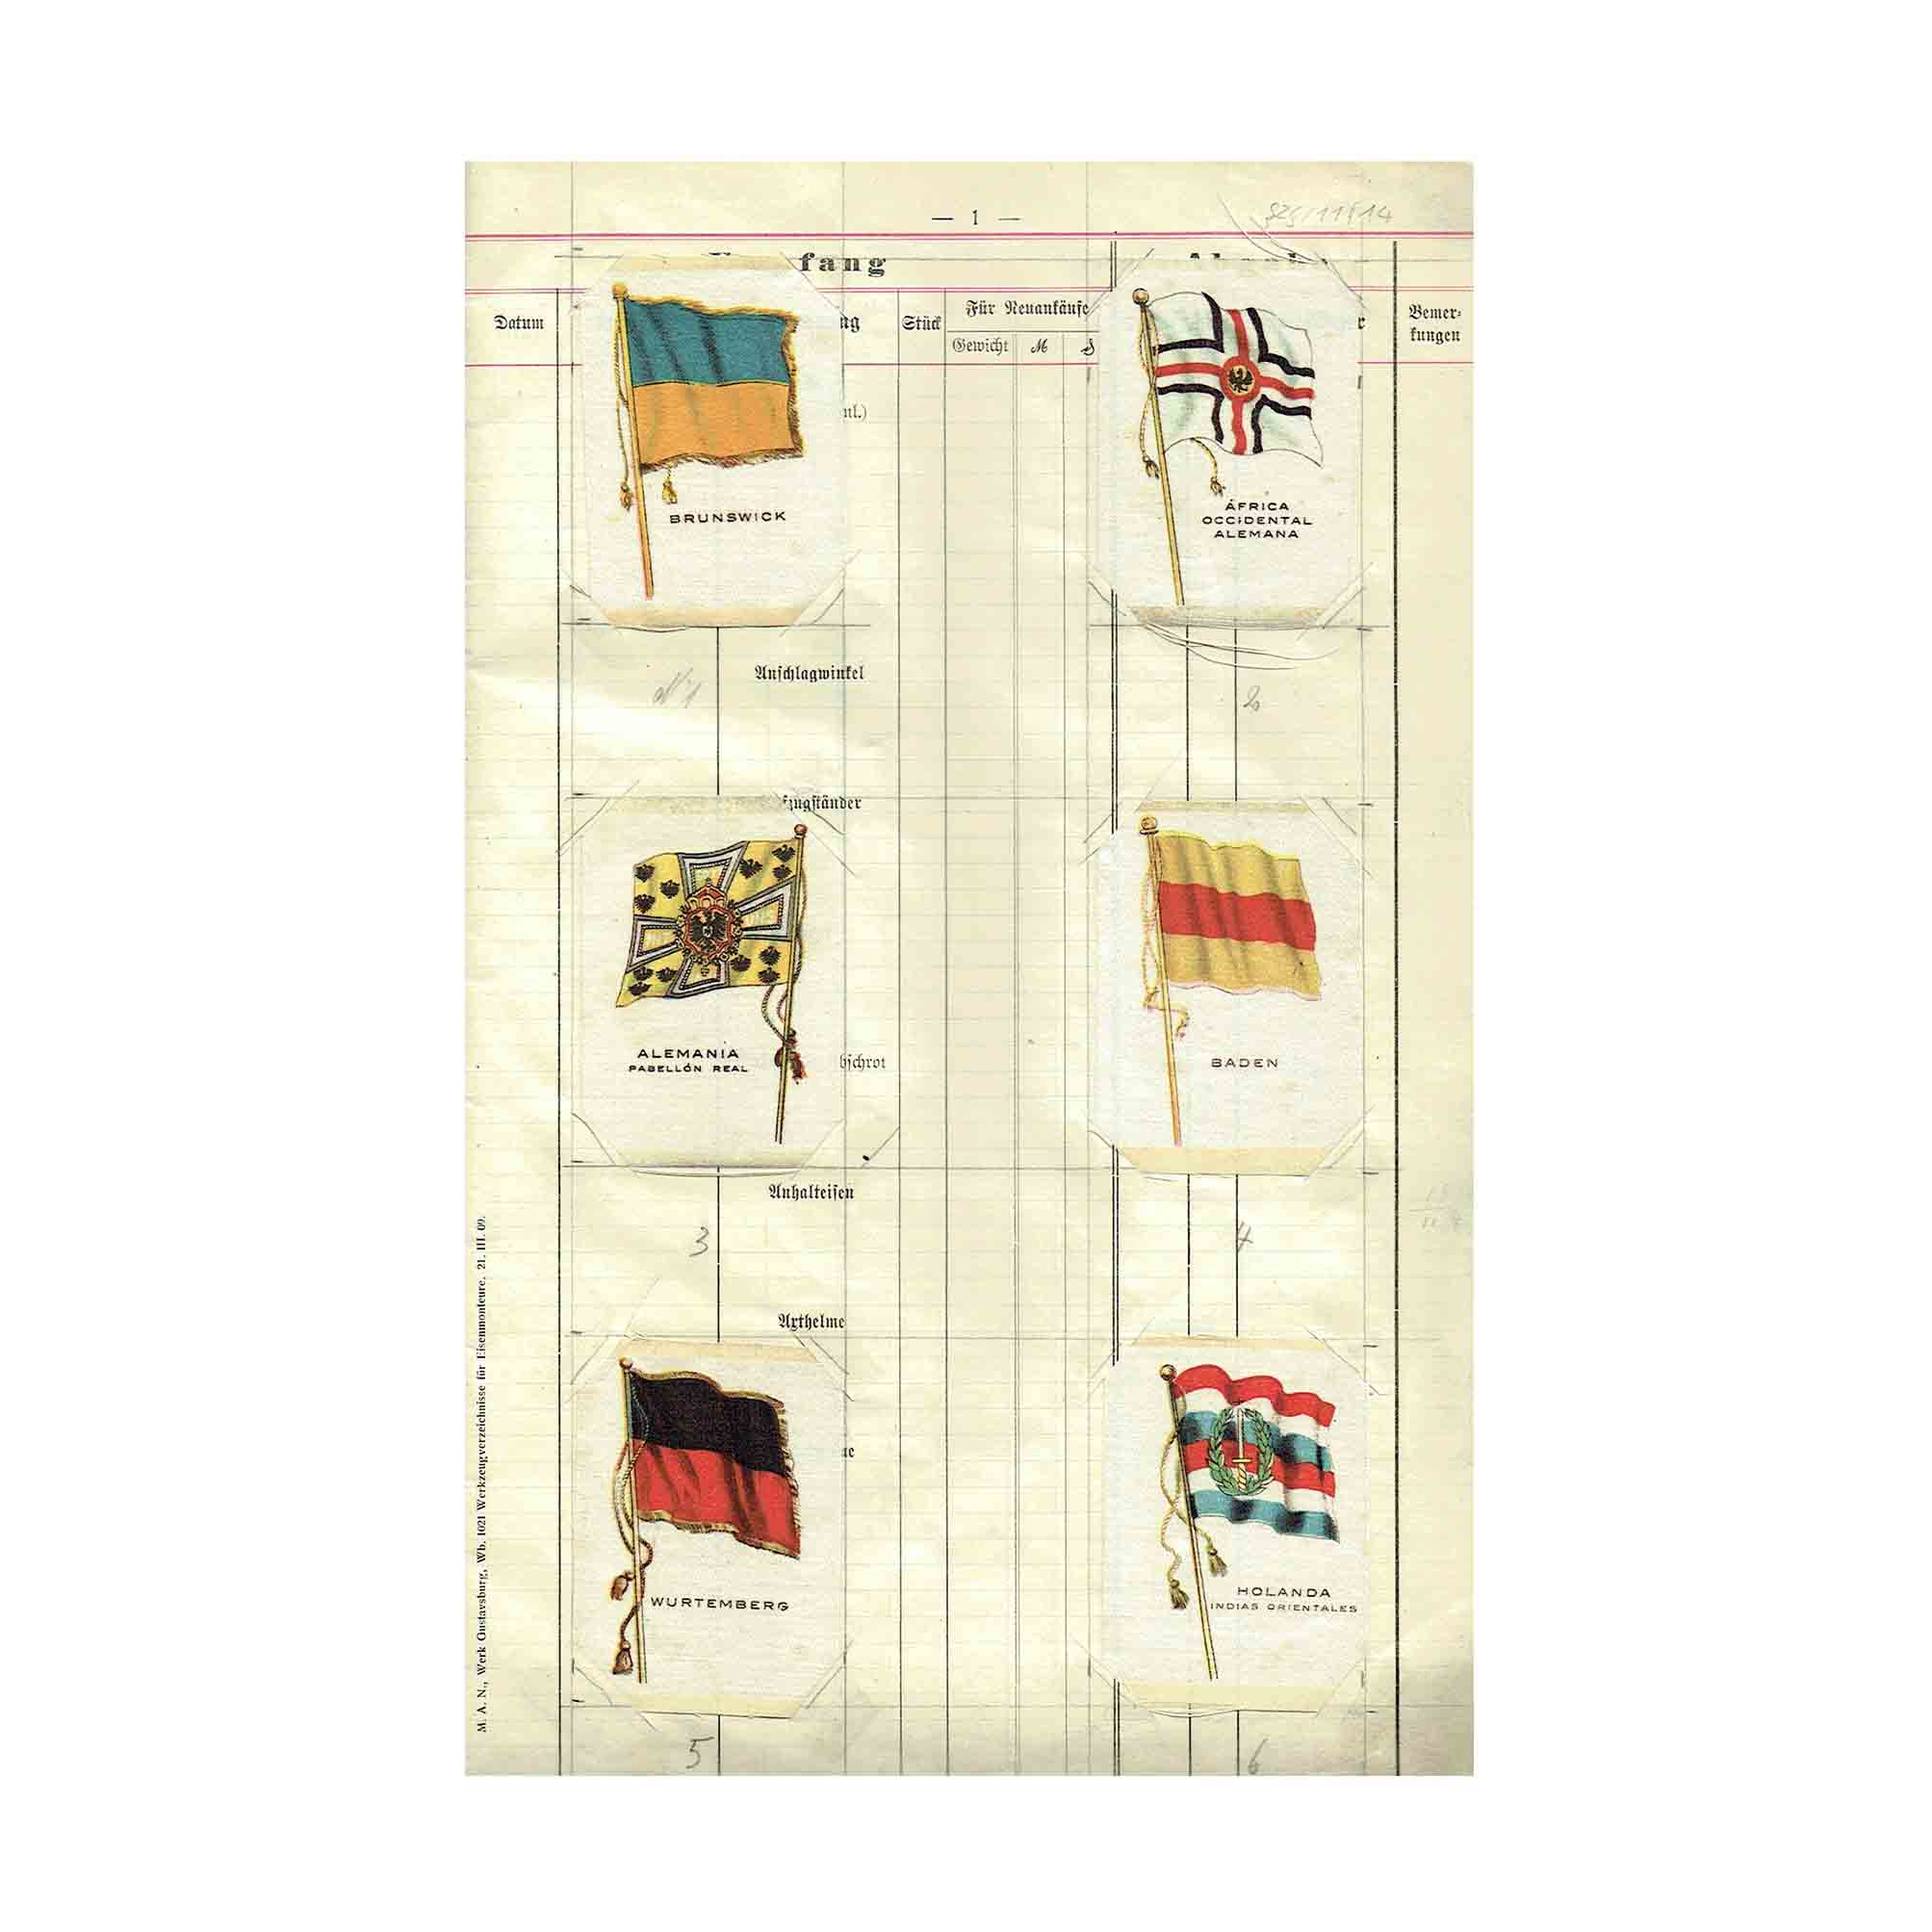 5988-Sammlung-Schiffsflaggen-Seidendruck-1910-1-N.jpeg